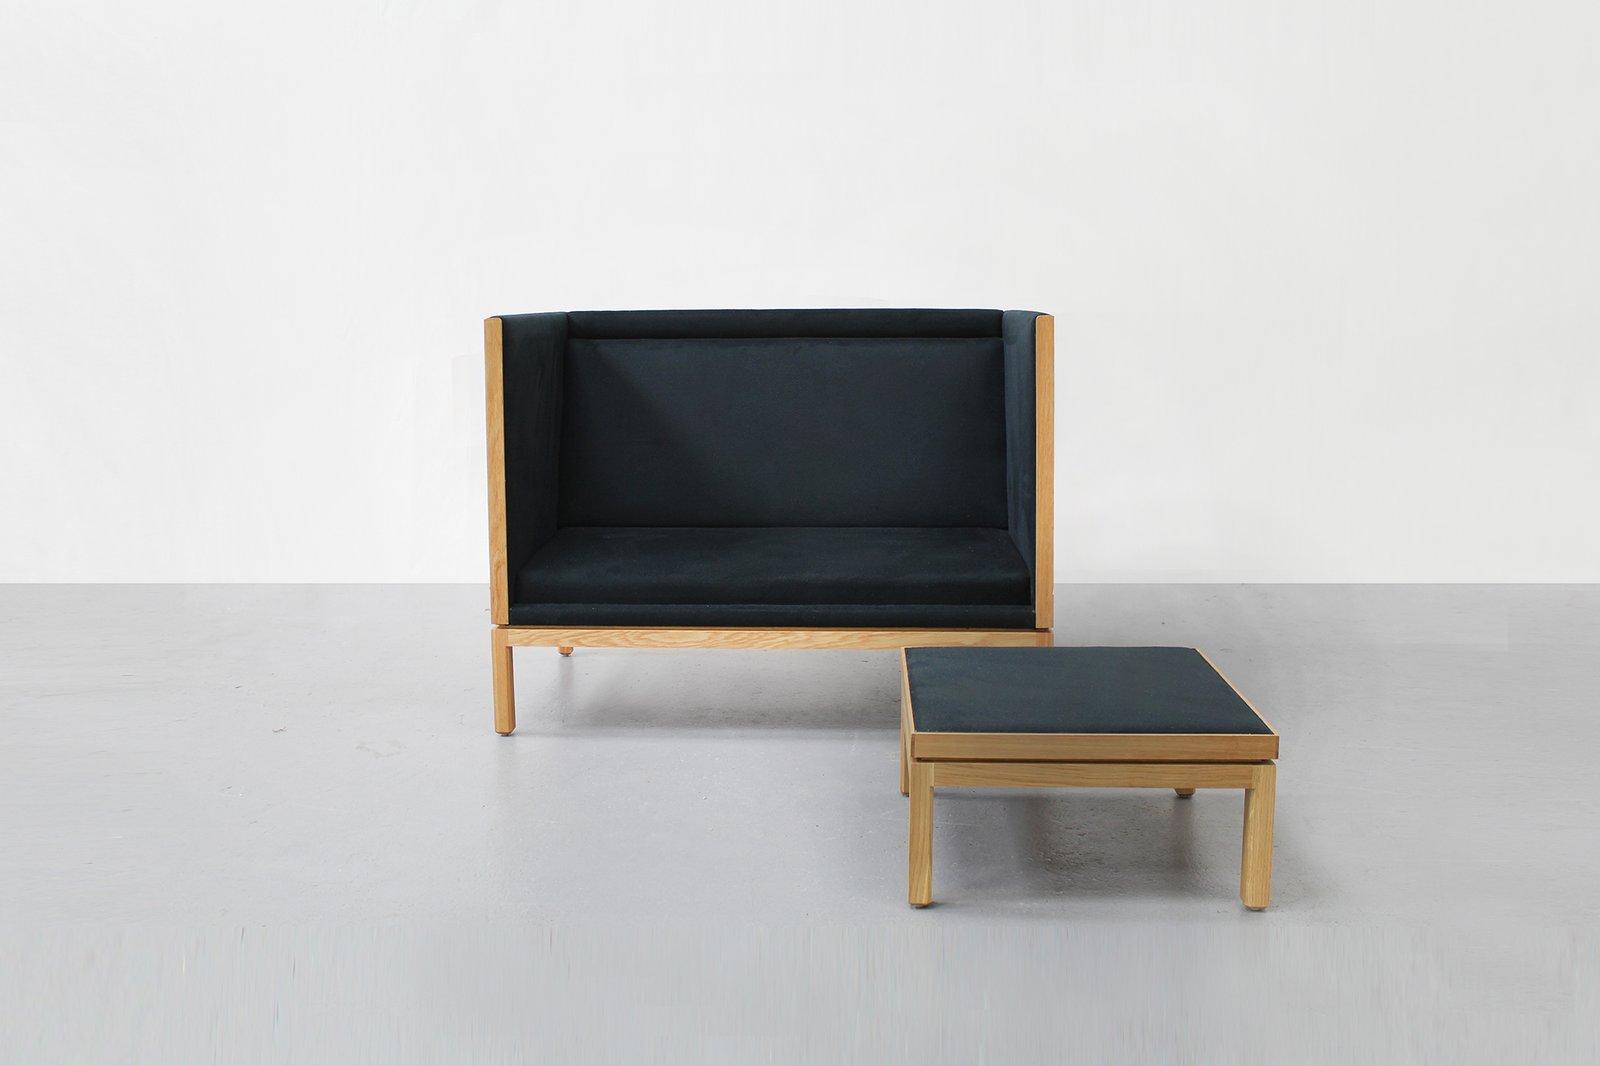 #seatingdesign #seating #MichaelAnastassiades #sofa #Rochester #minimalist #modern #design #furniture   100+ Best Modern Seating Designs by Dwell